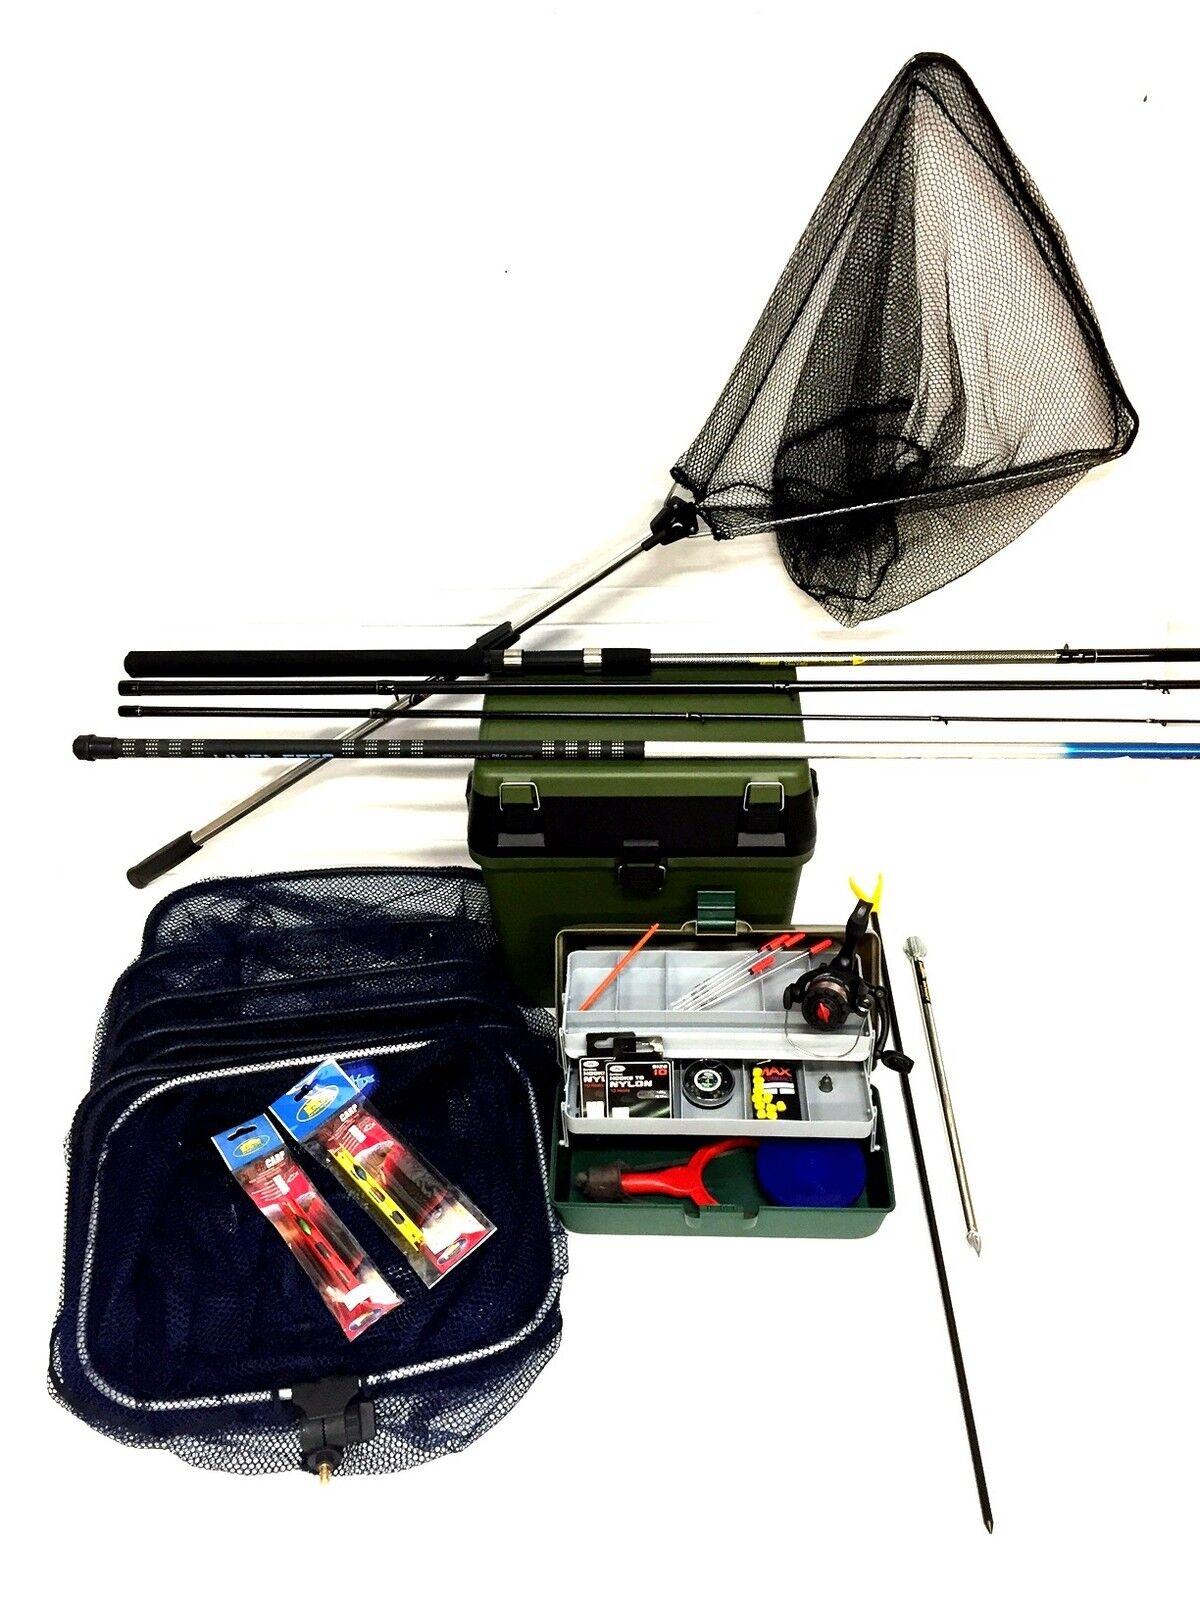 Drijf bij de visserijKit zet Okuma 12 ft Rod, Reel, Box Tackle Rigs Pole